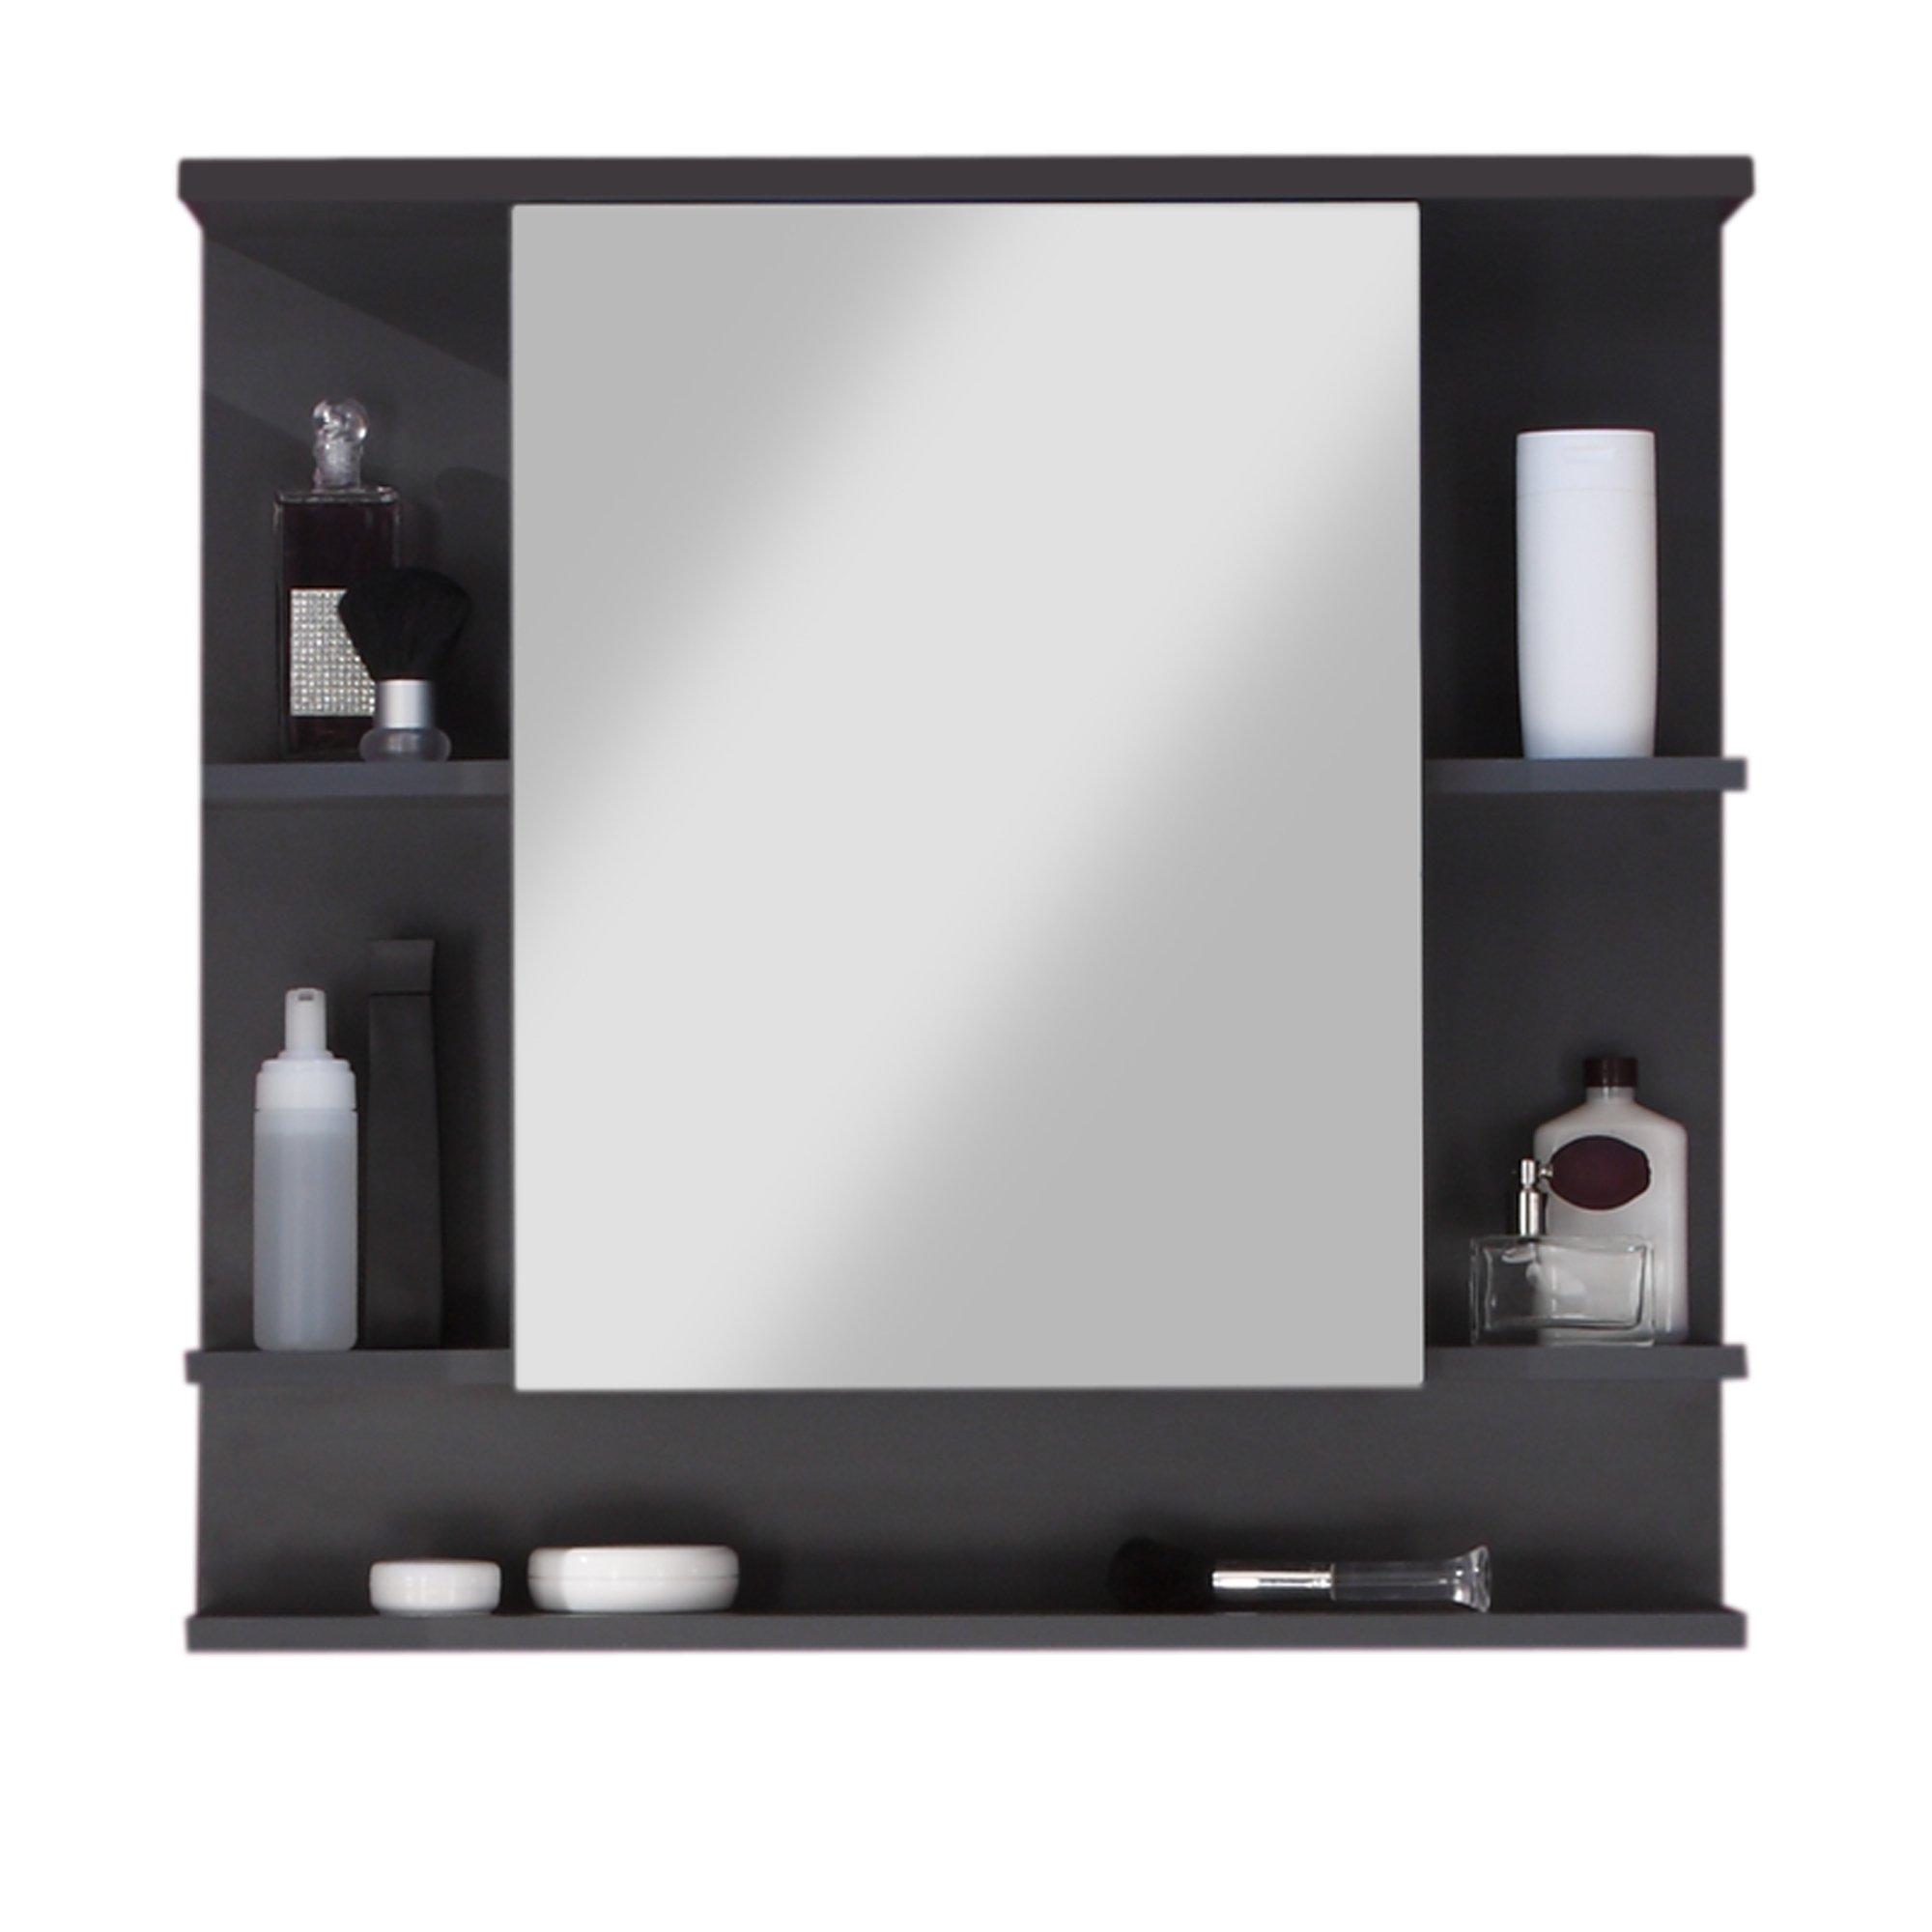 Miroir Sympa Salle De Bain ~ armoire de toilette miroir amazon fr